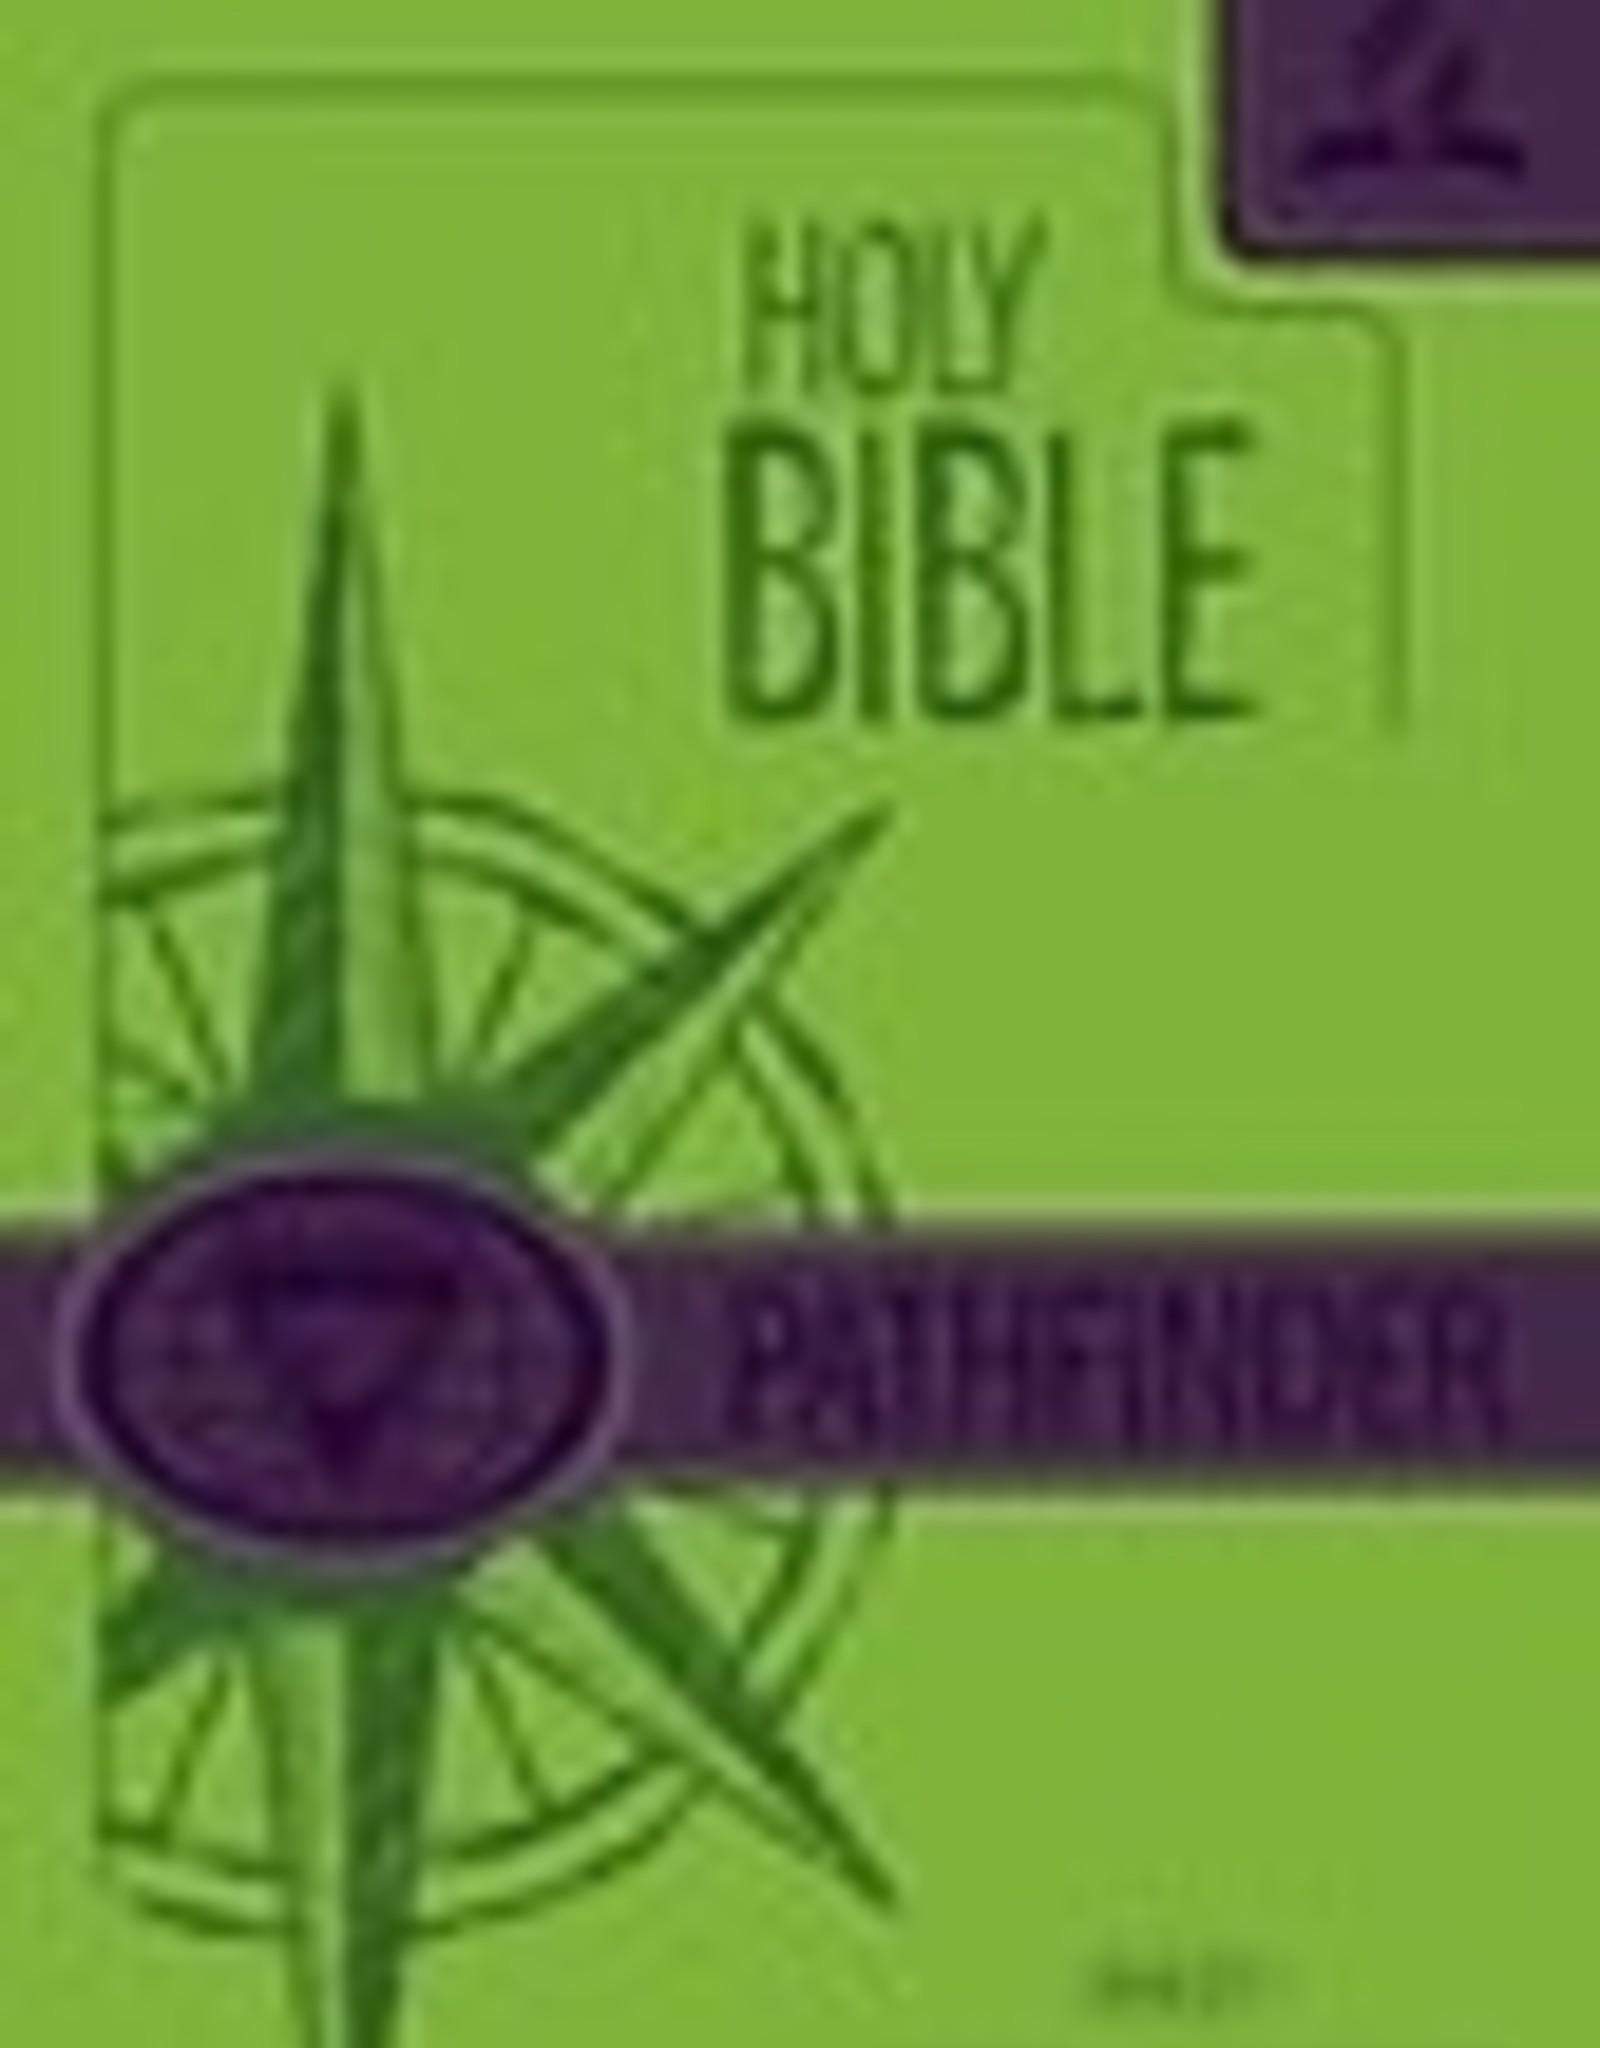 New King James Version Holy Bible - Pathfinder